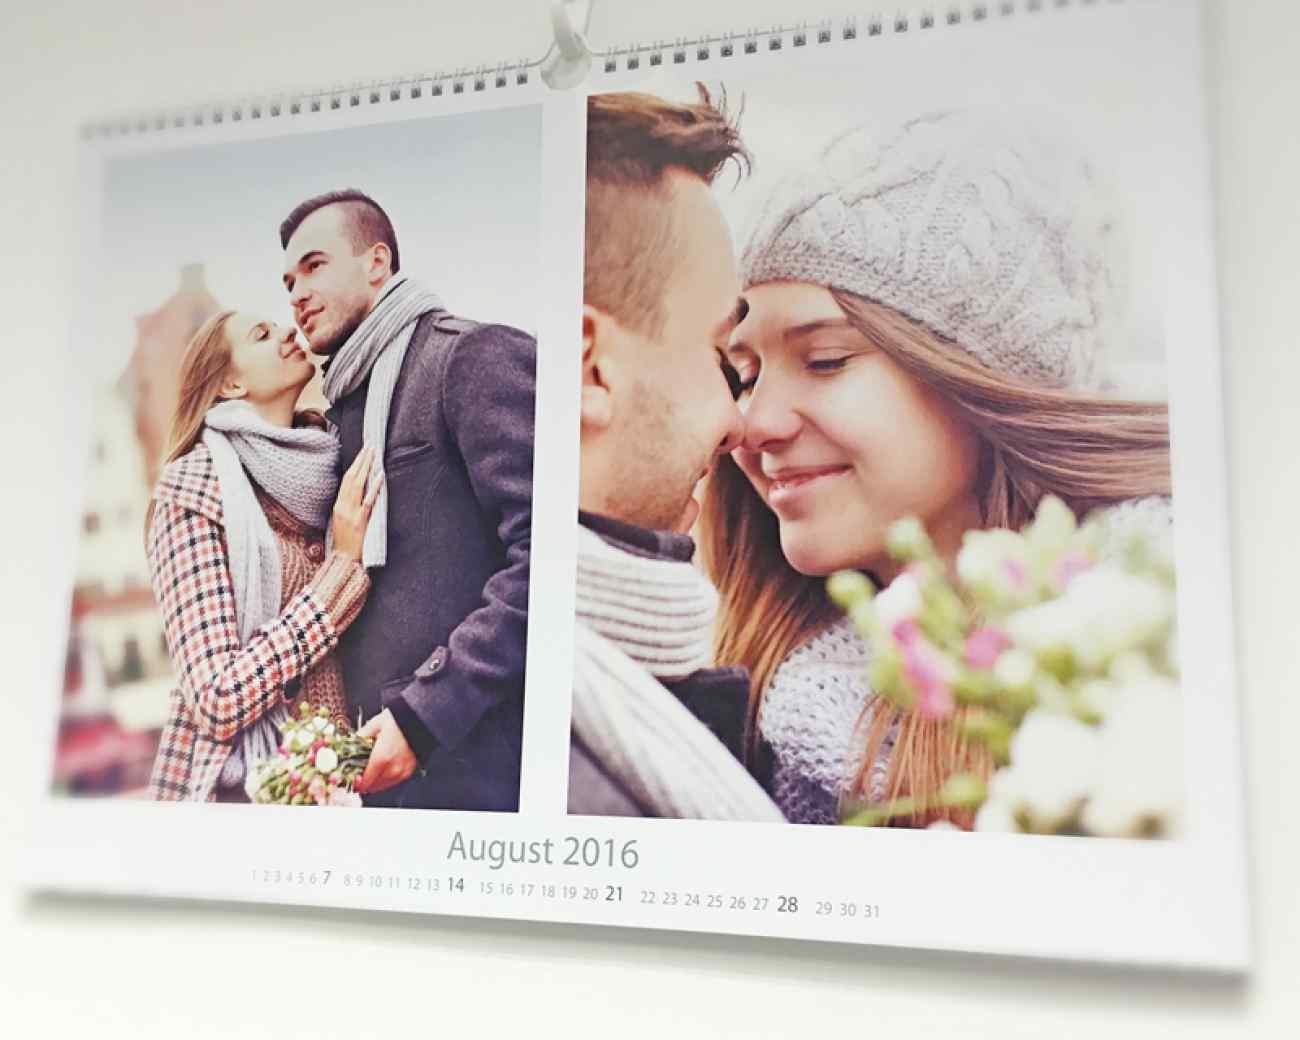 Calendar A3 Landscape inner page print mobile app